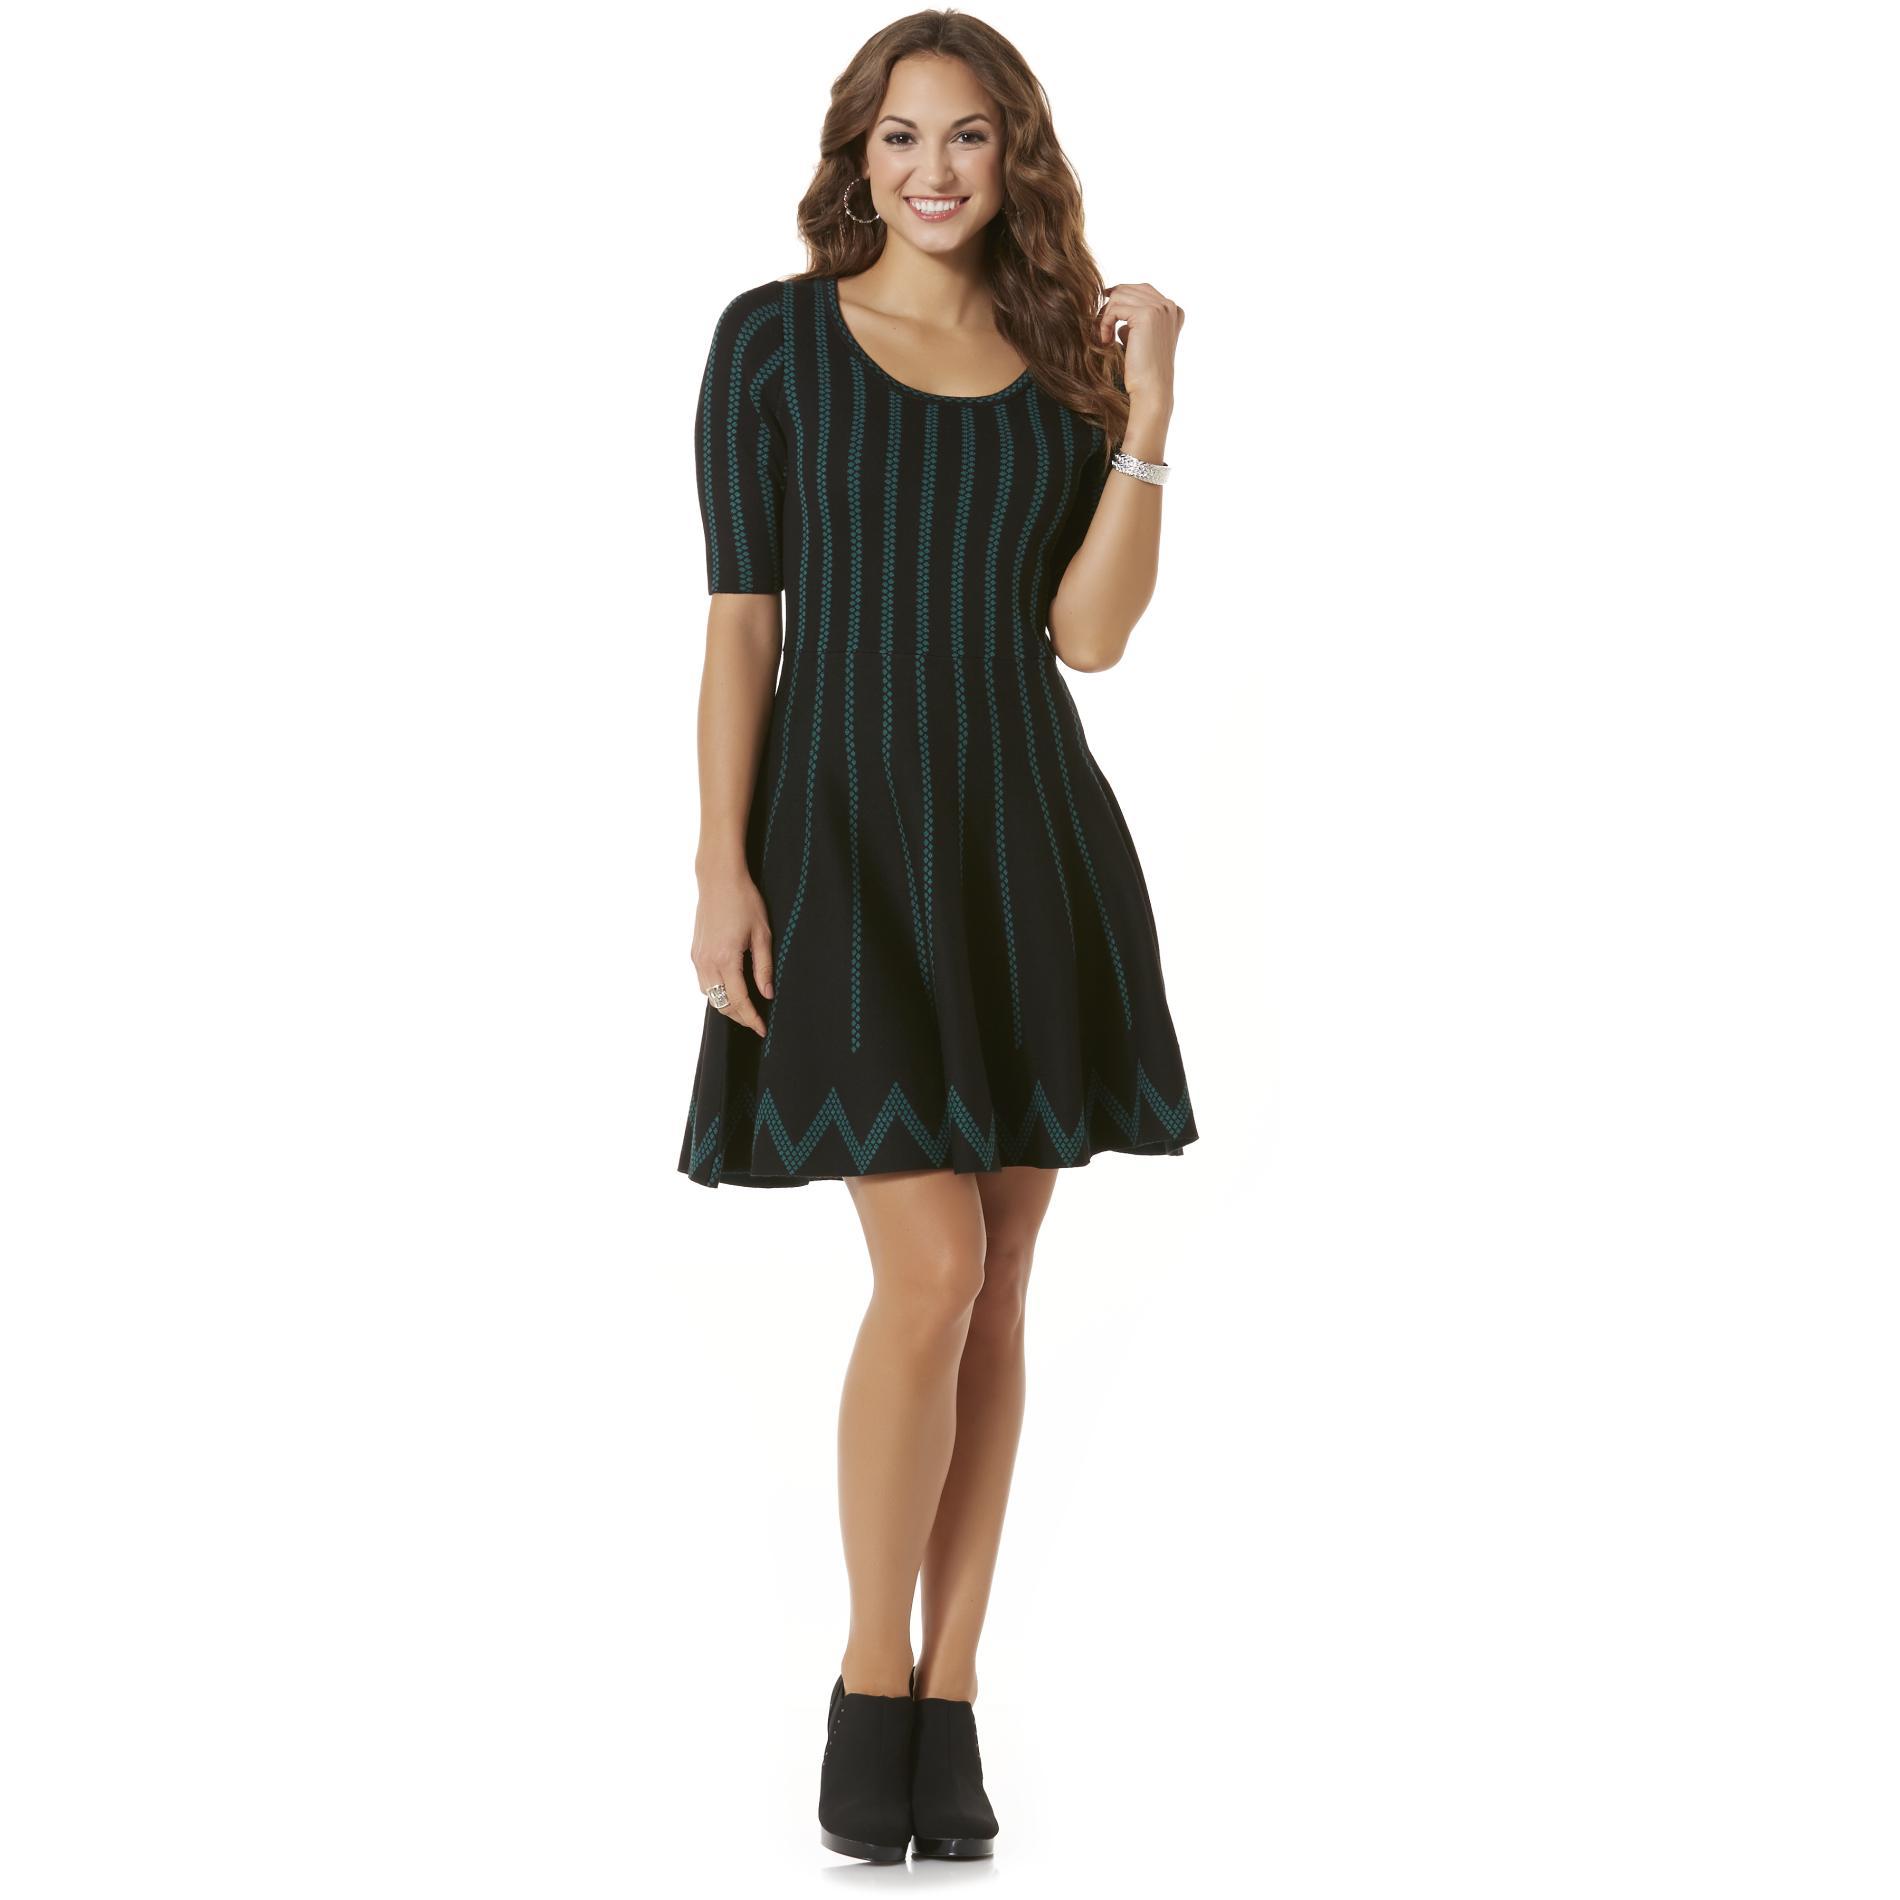 Gabby Skye Women's Sweater Dress - Striped